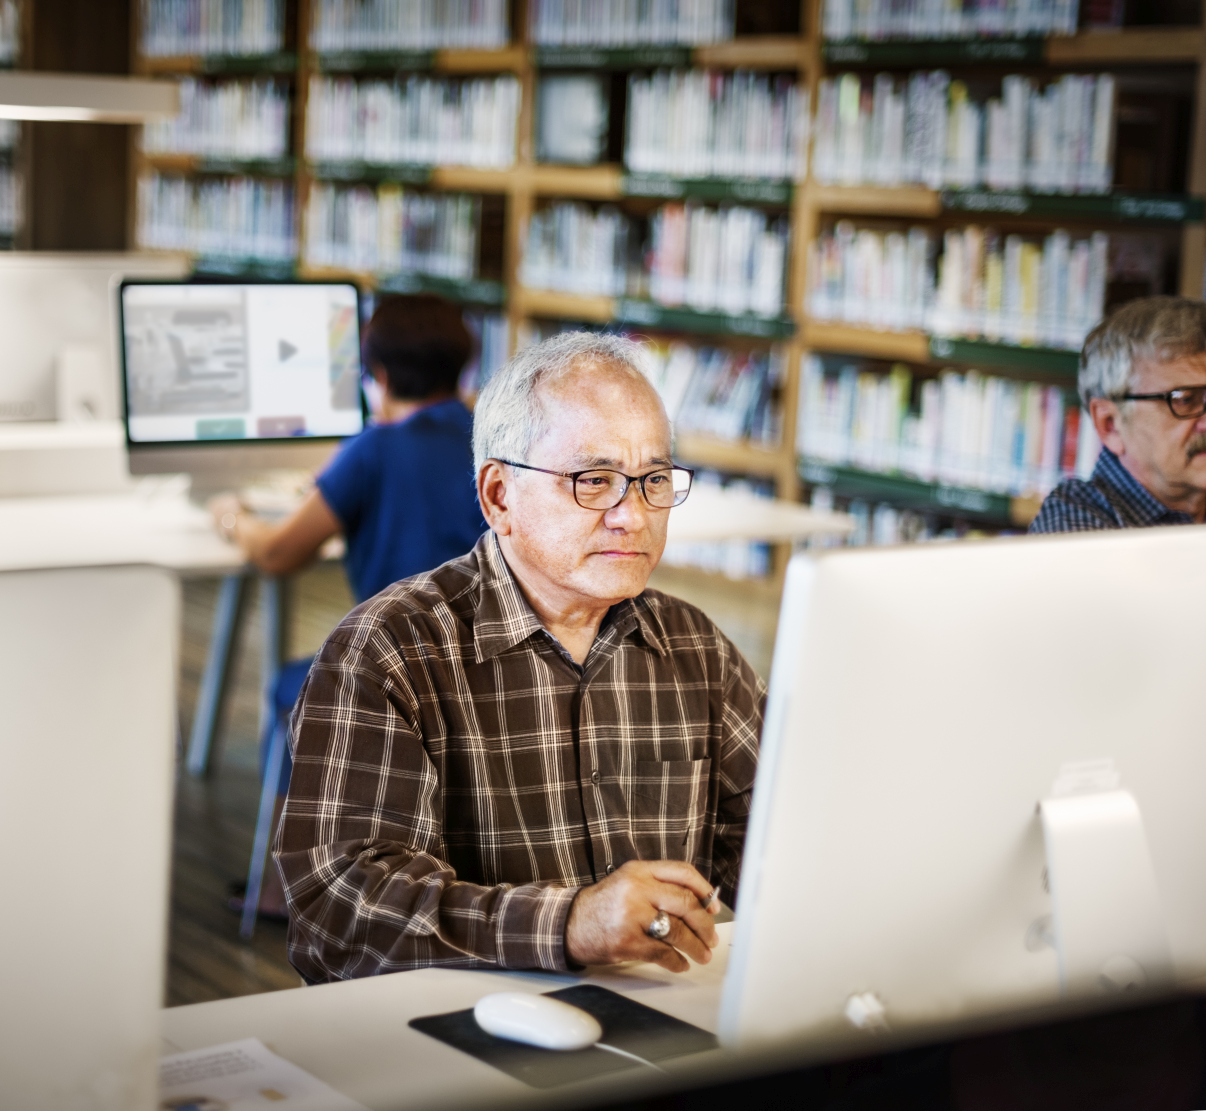 Teacher Preparing Studying School Library Concept